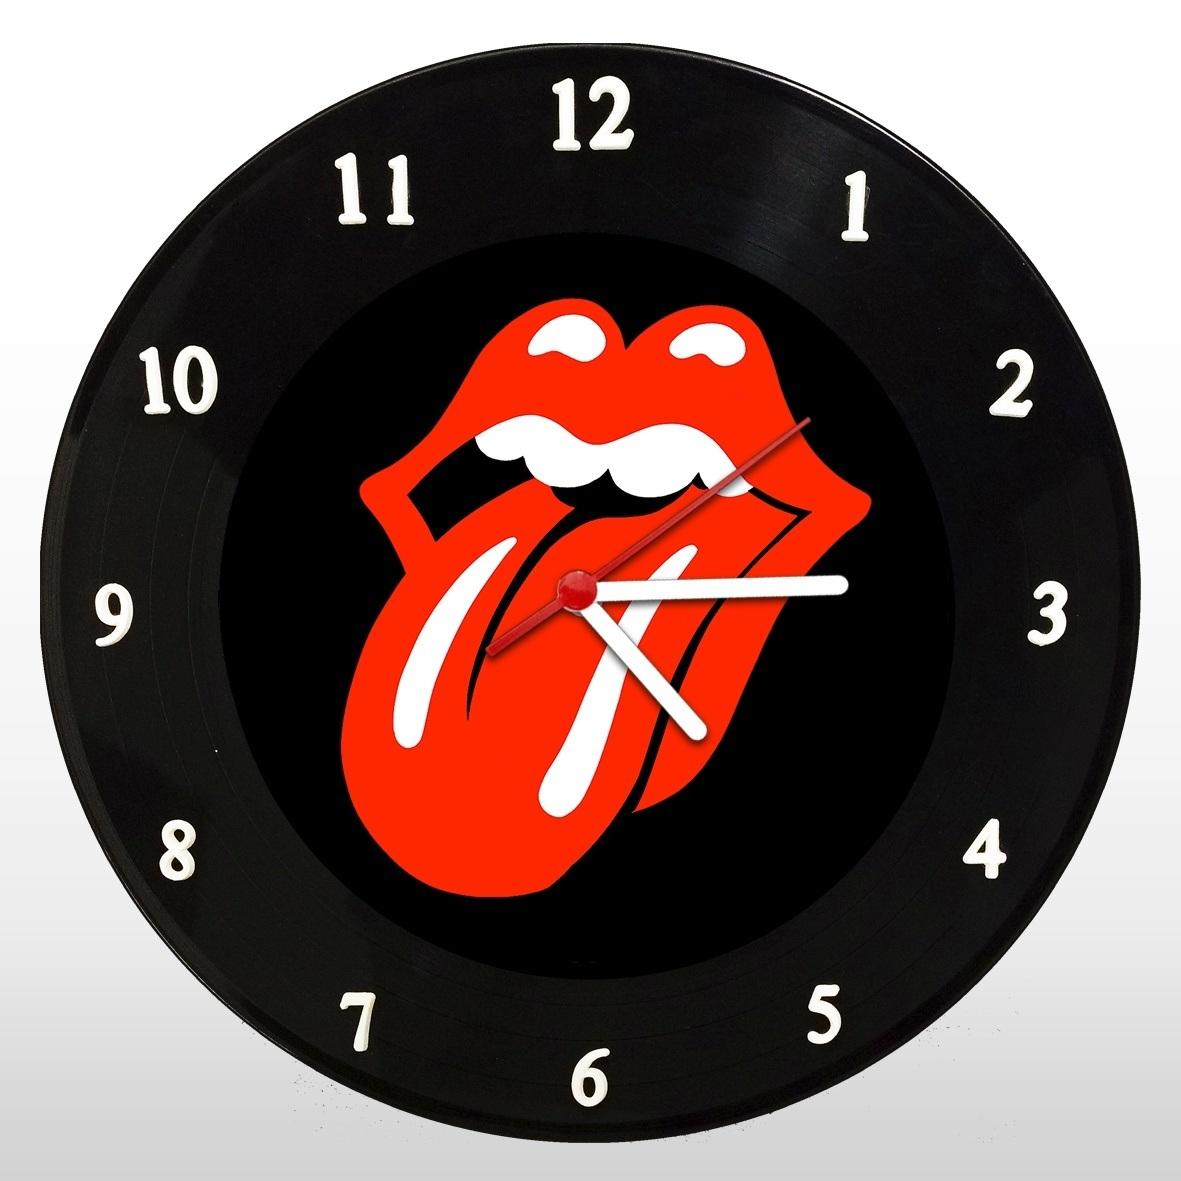 Rolling Stones - Relógio de Parede em Disco de Vinil - Mr. Rock